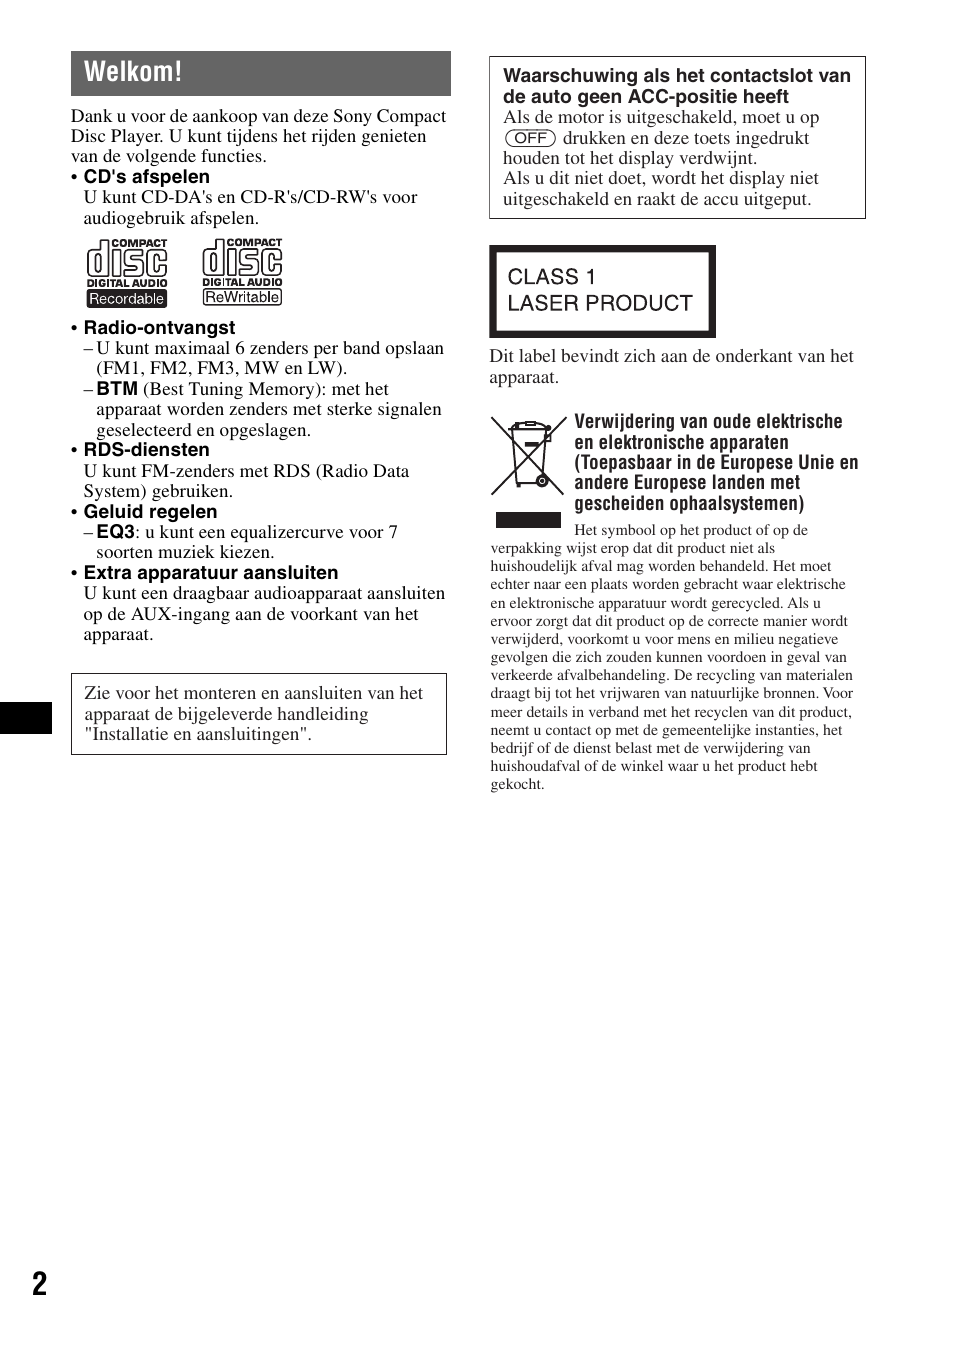 Sony Cdx Gt100 Wiring Diagram   Schematic Diagram Sony Cdx Gt W Wiring Diagram Manual on sony wiring harness colors, sony cdx gt57up wiring-diagram, sony cdx m20 wiring-diagram, sony cdx gt24w, sony cdx gt33w manual,